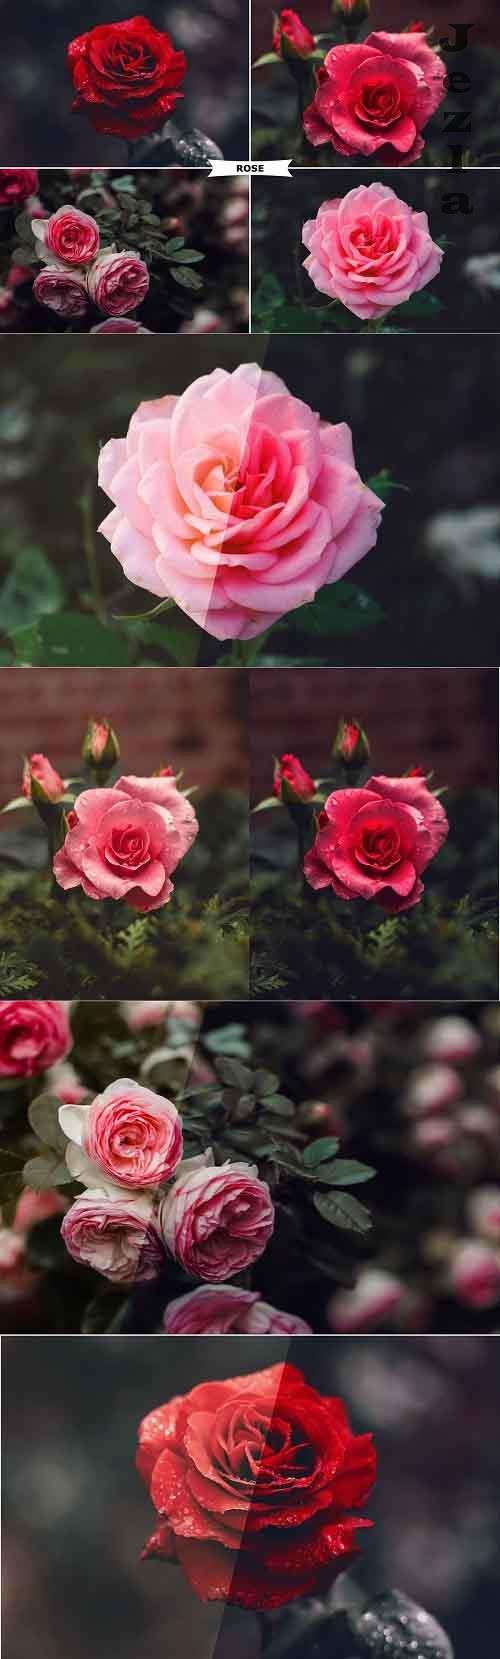 Rose PHSP Action 4974092